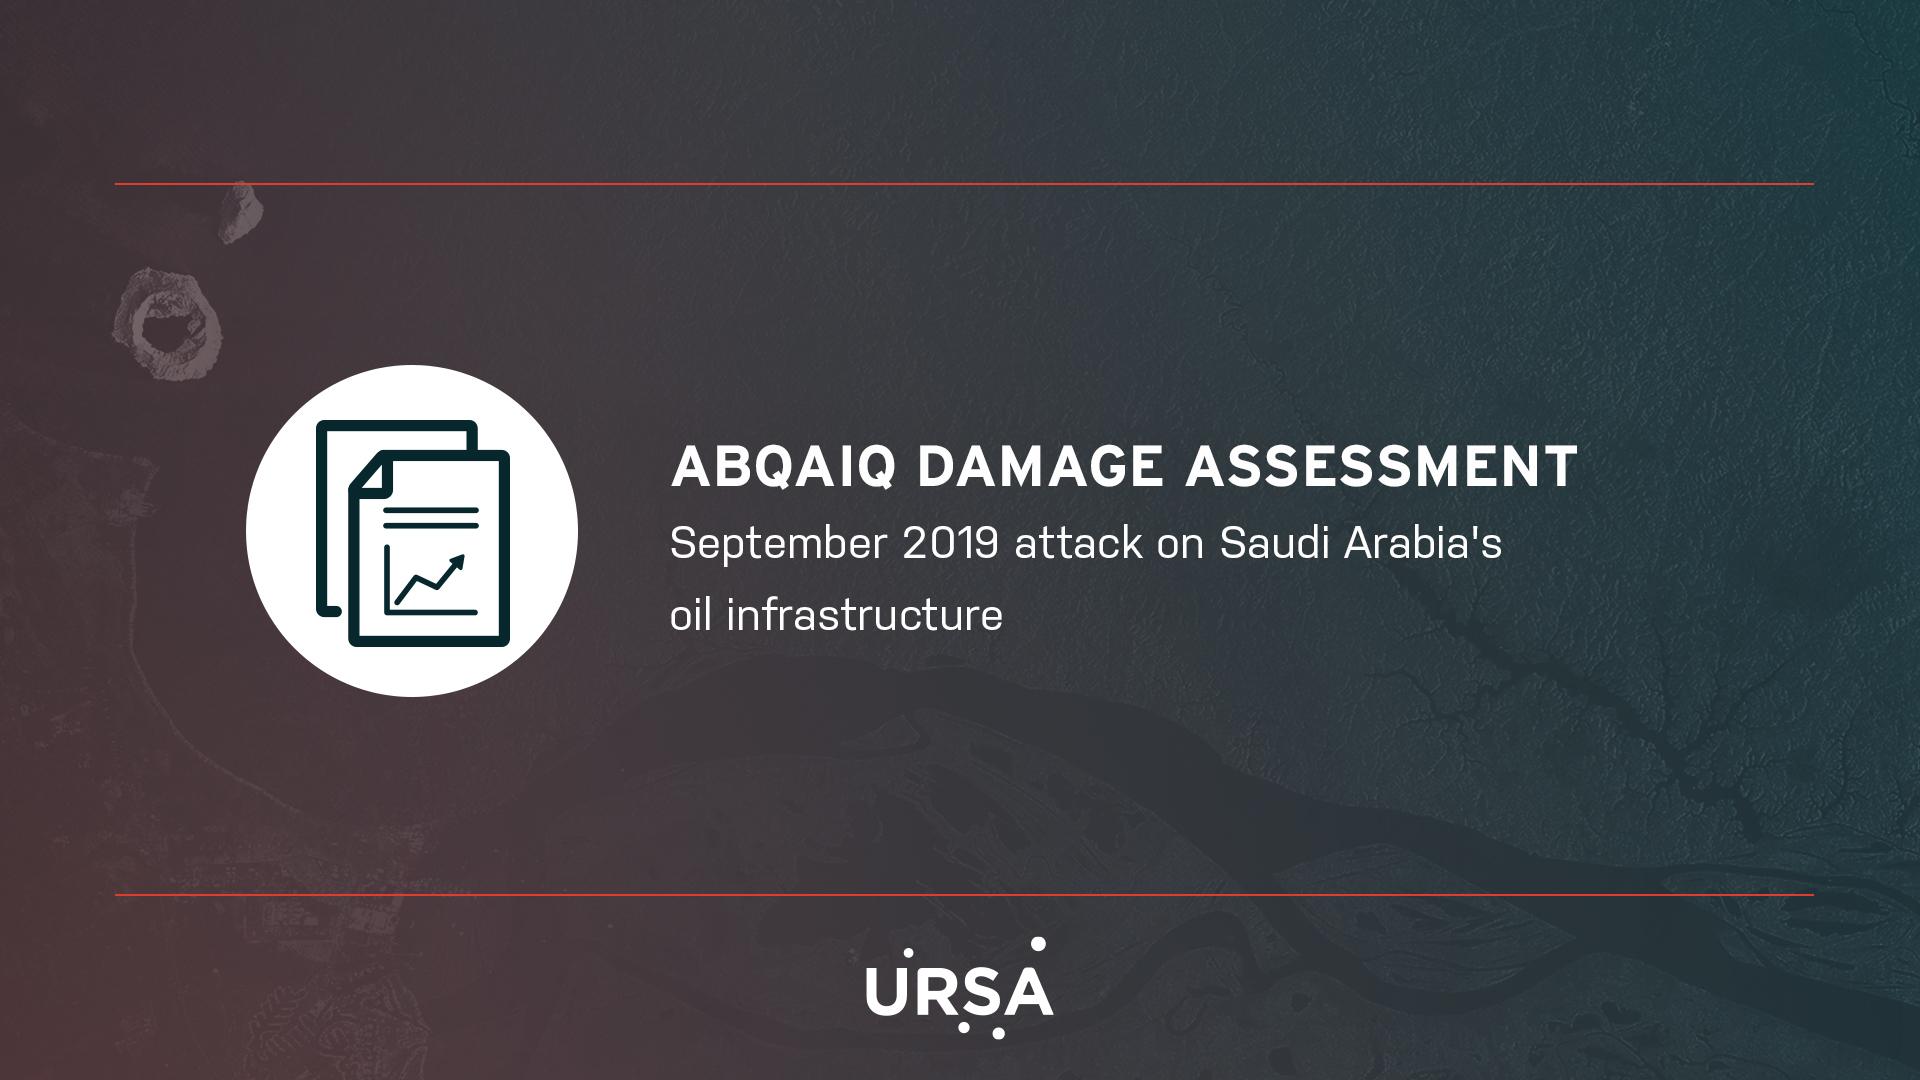 Abqaiq Damage Assessment